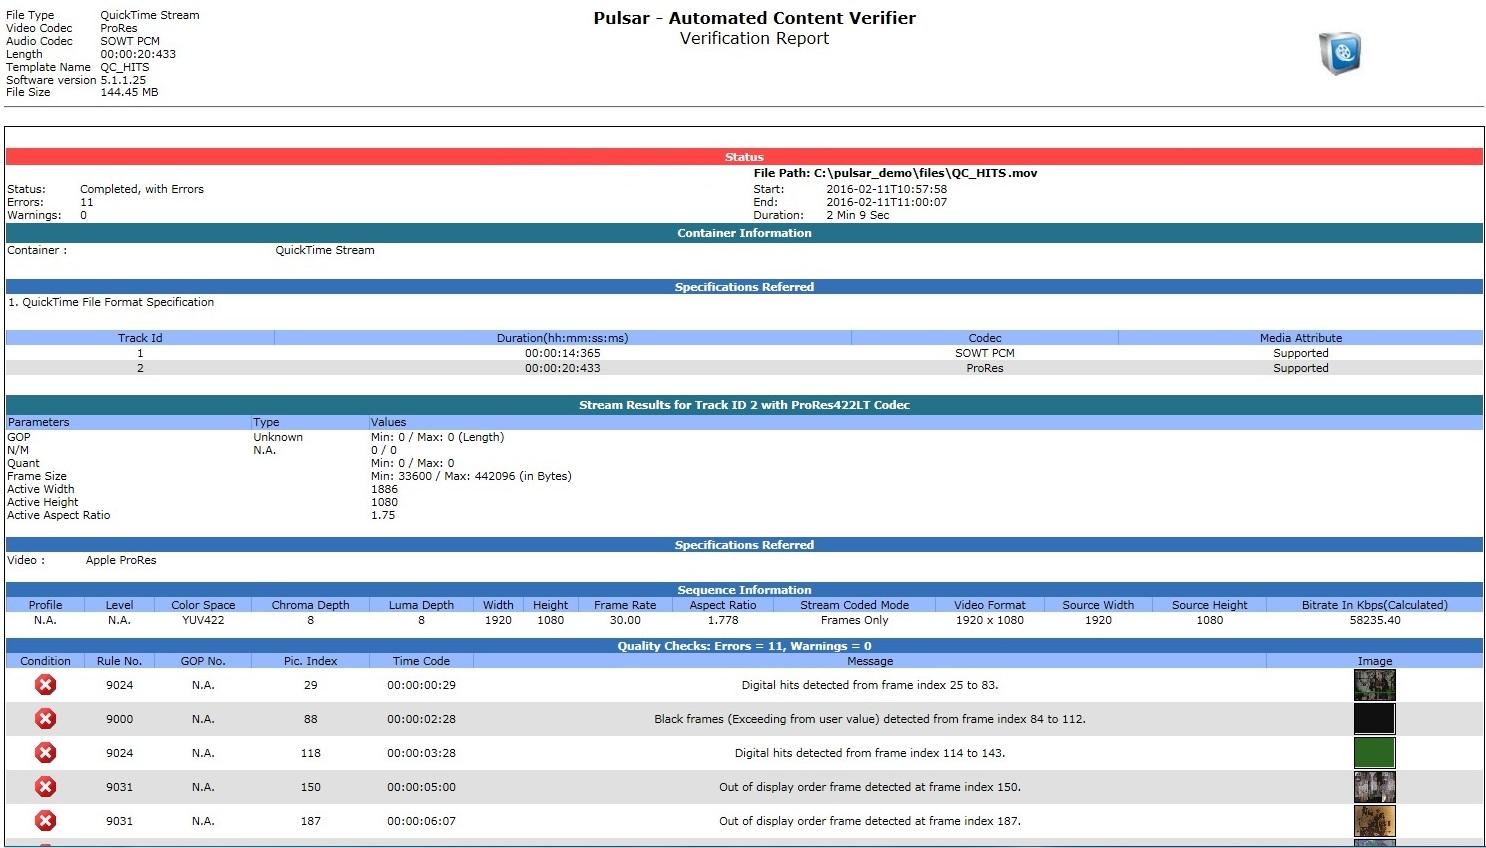 Screenshot - Pulsar Report (5.1.1.27)